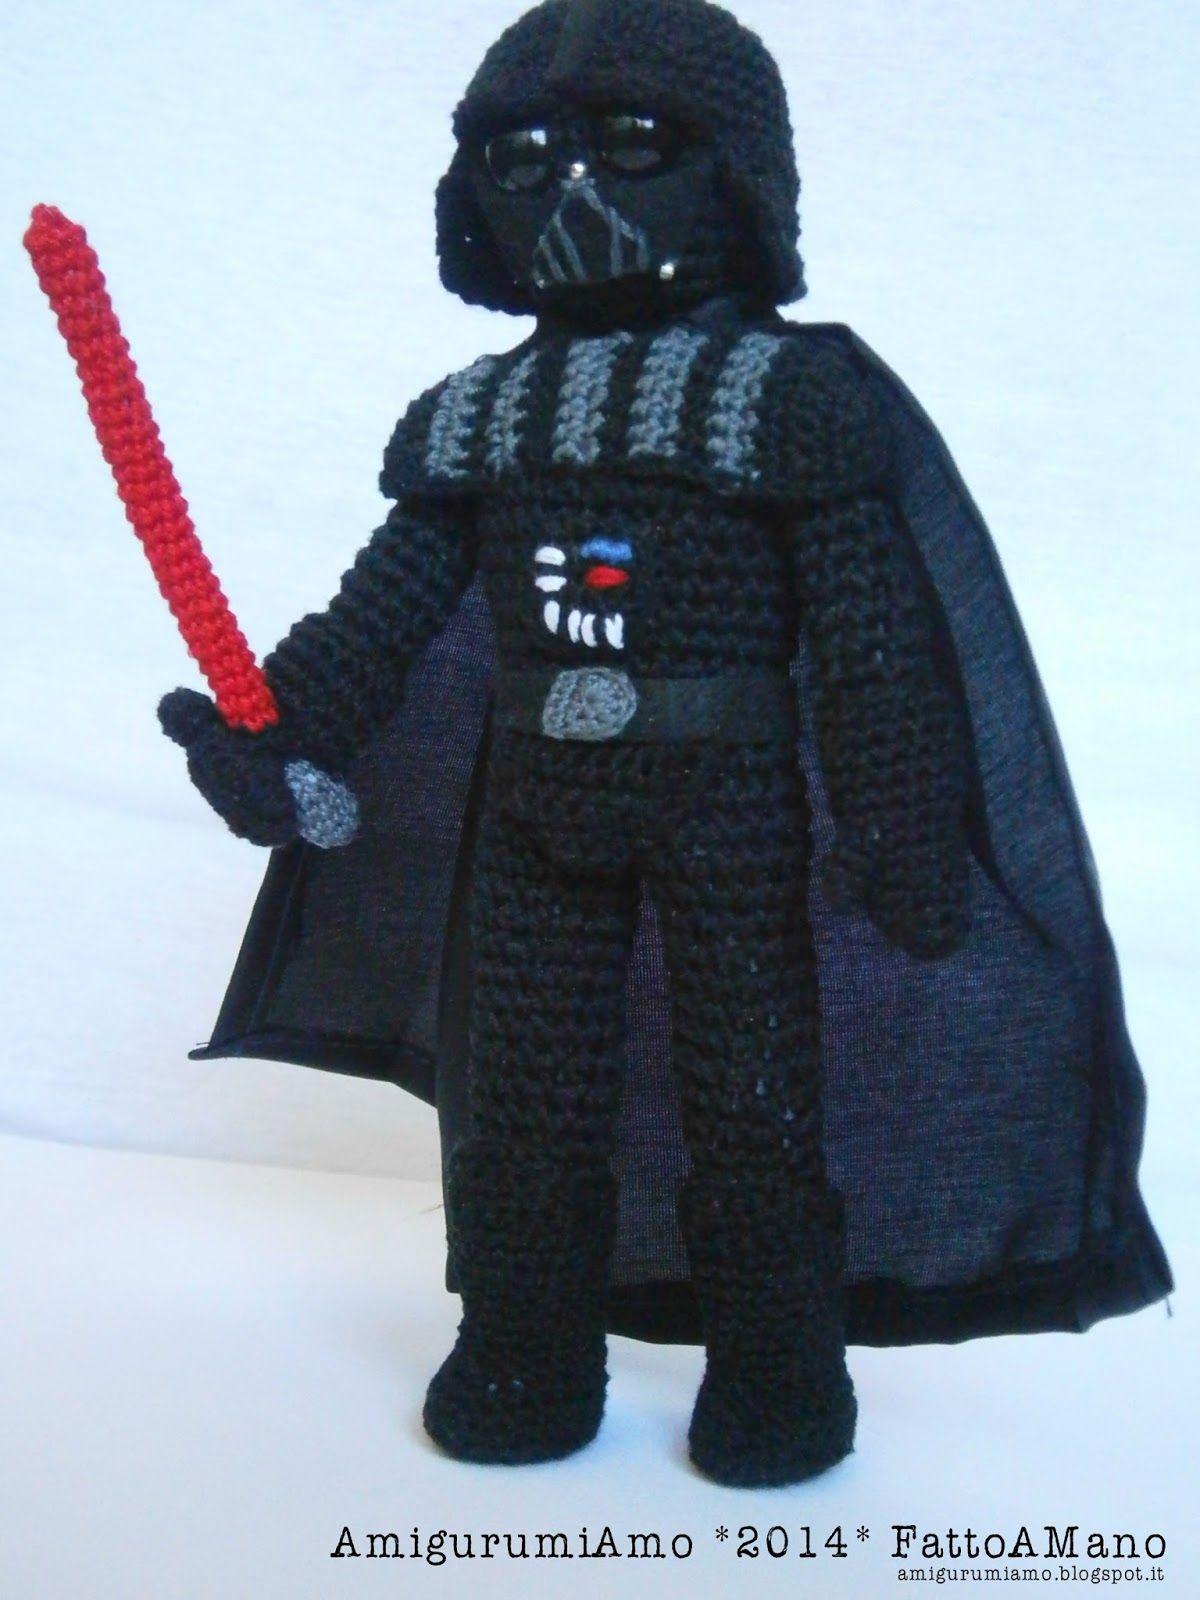 Freeamigurumiamo Darth Vader Amigarumi Pattern I Used Google